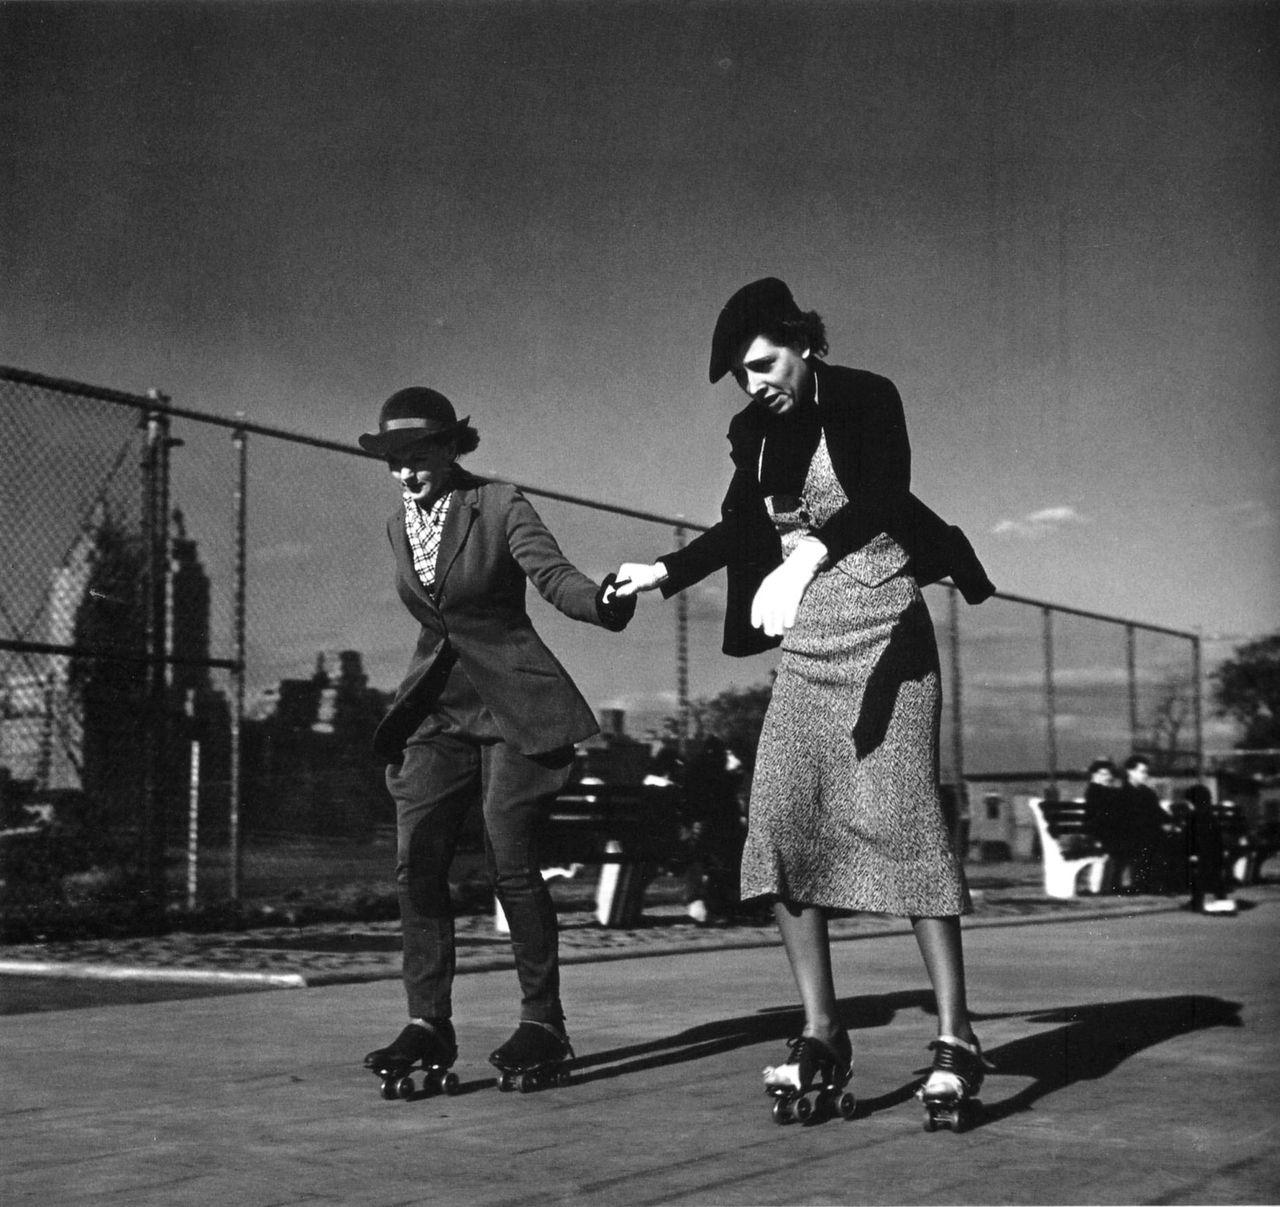 John Gutmann: The Lesson, Central Park, New York, 1936